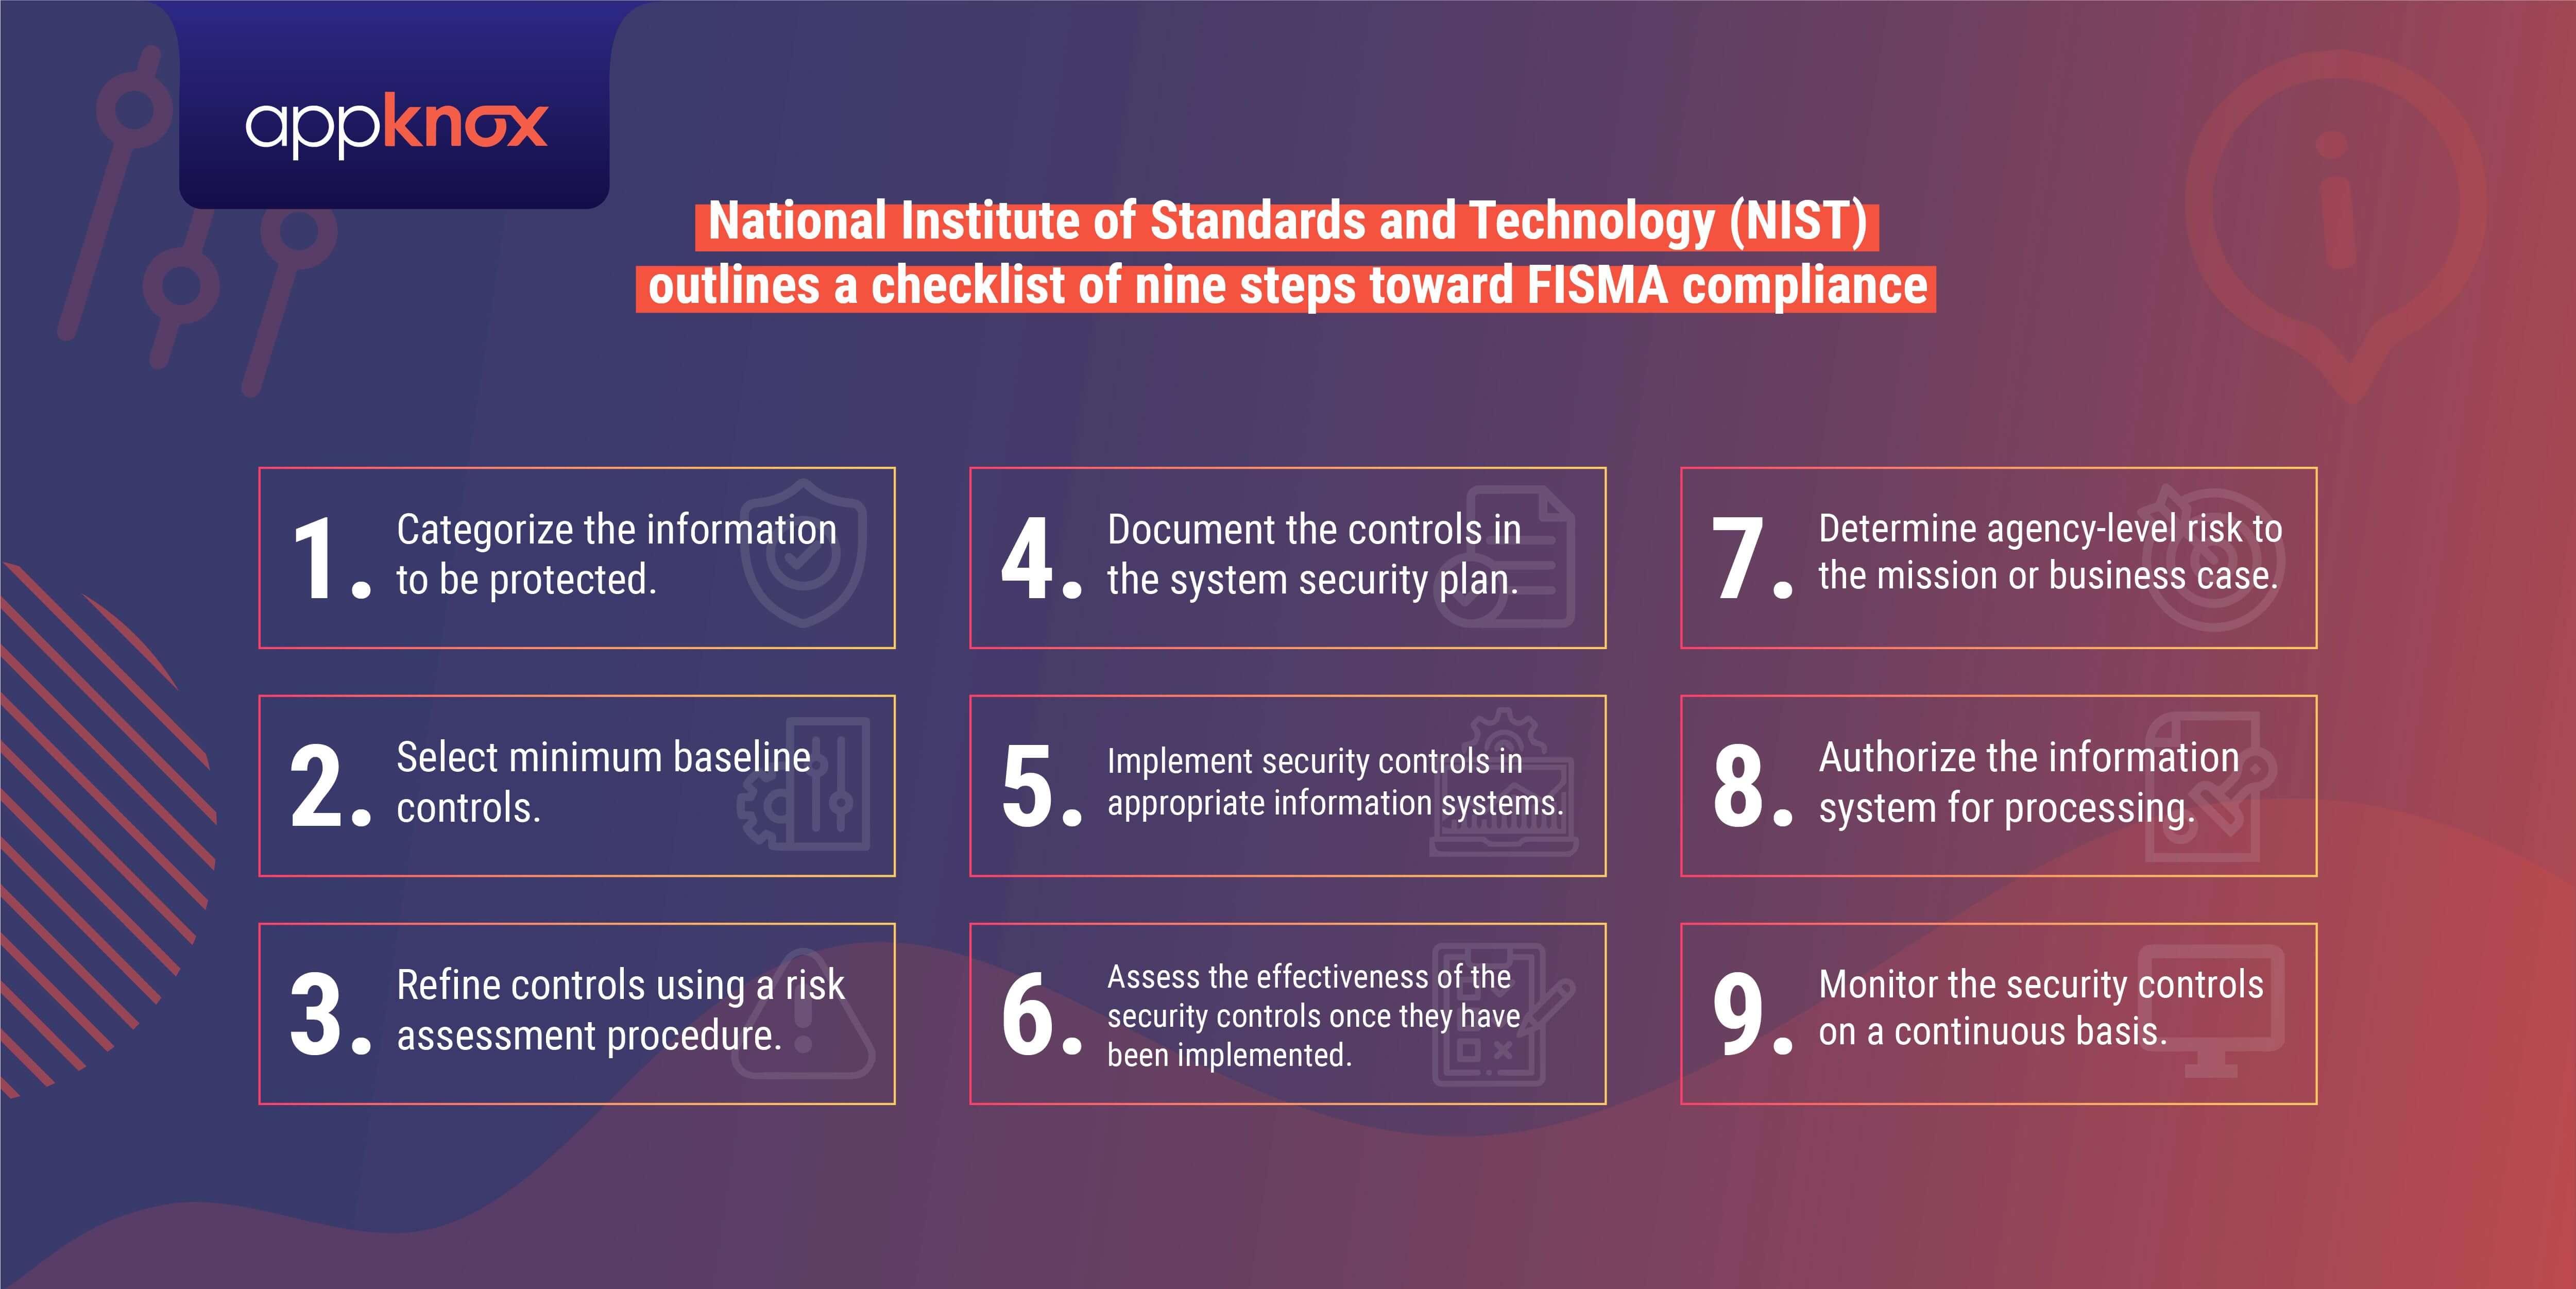 NIST outlines nine steps toward compliance with FISMA